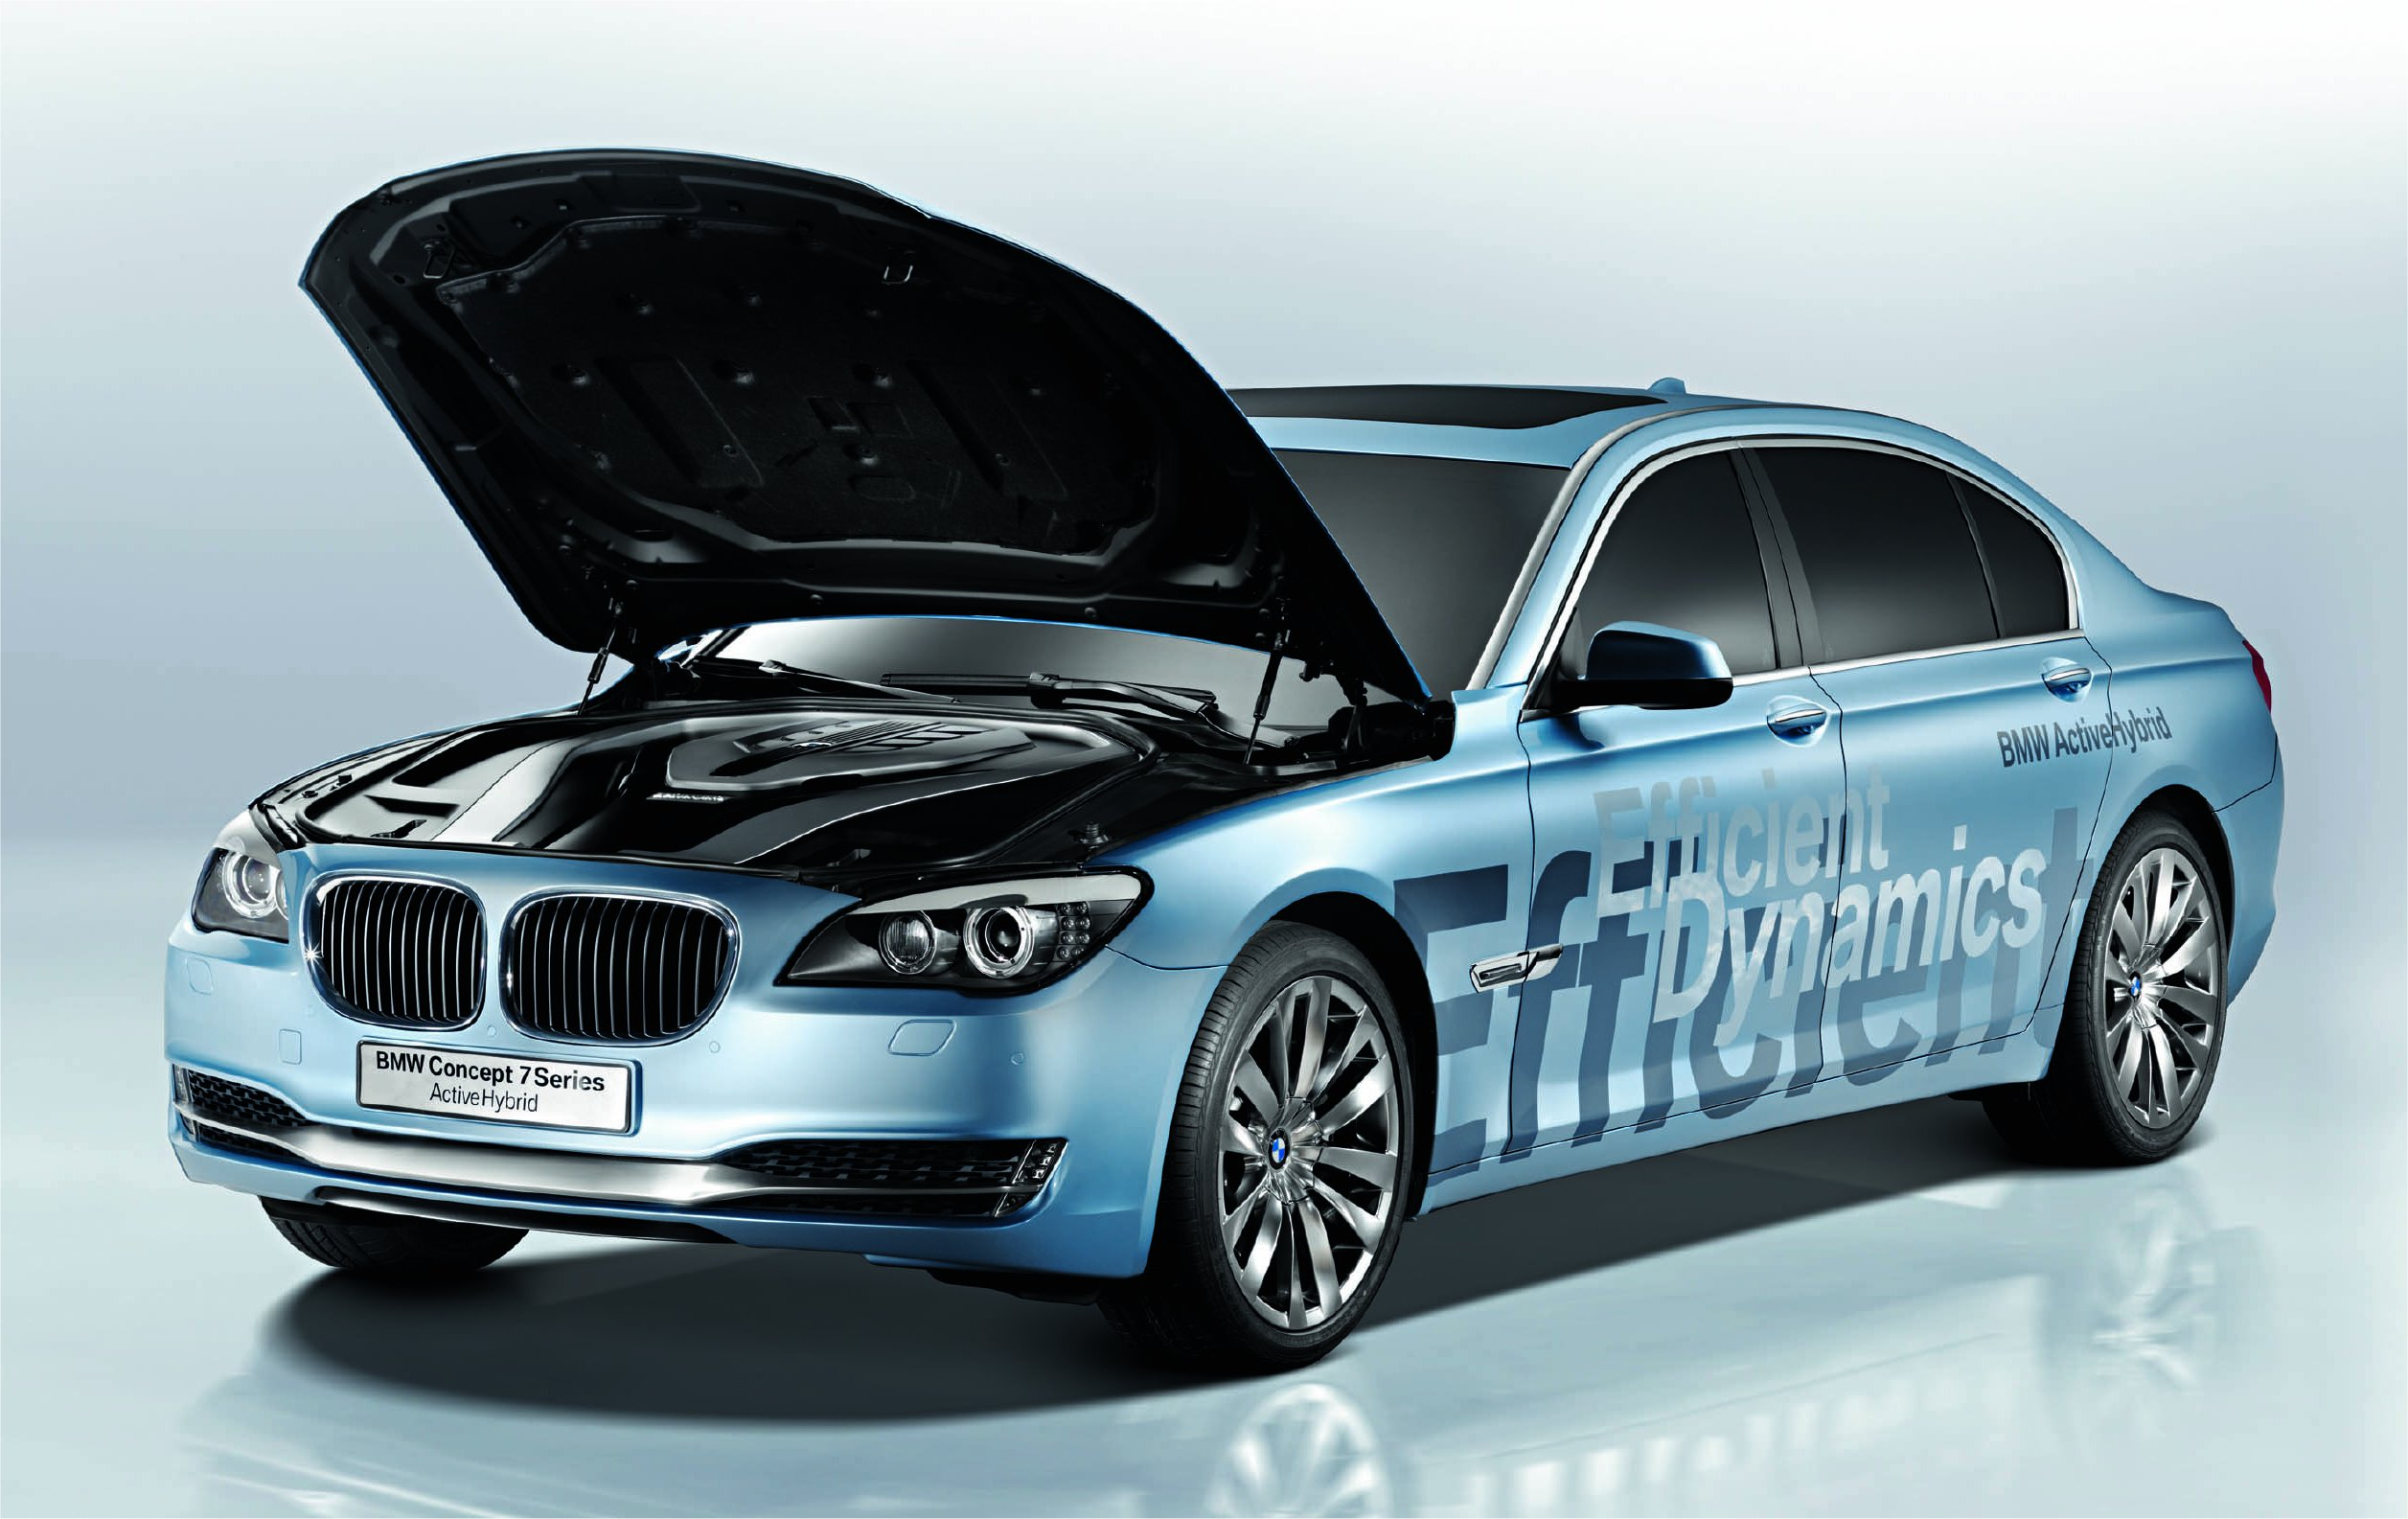 BMW 7 Series Concept Active Hybrid unveiled